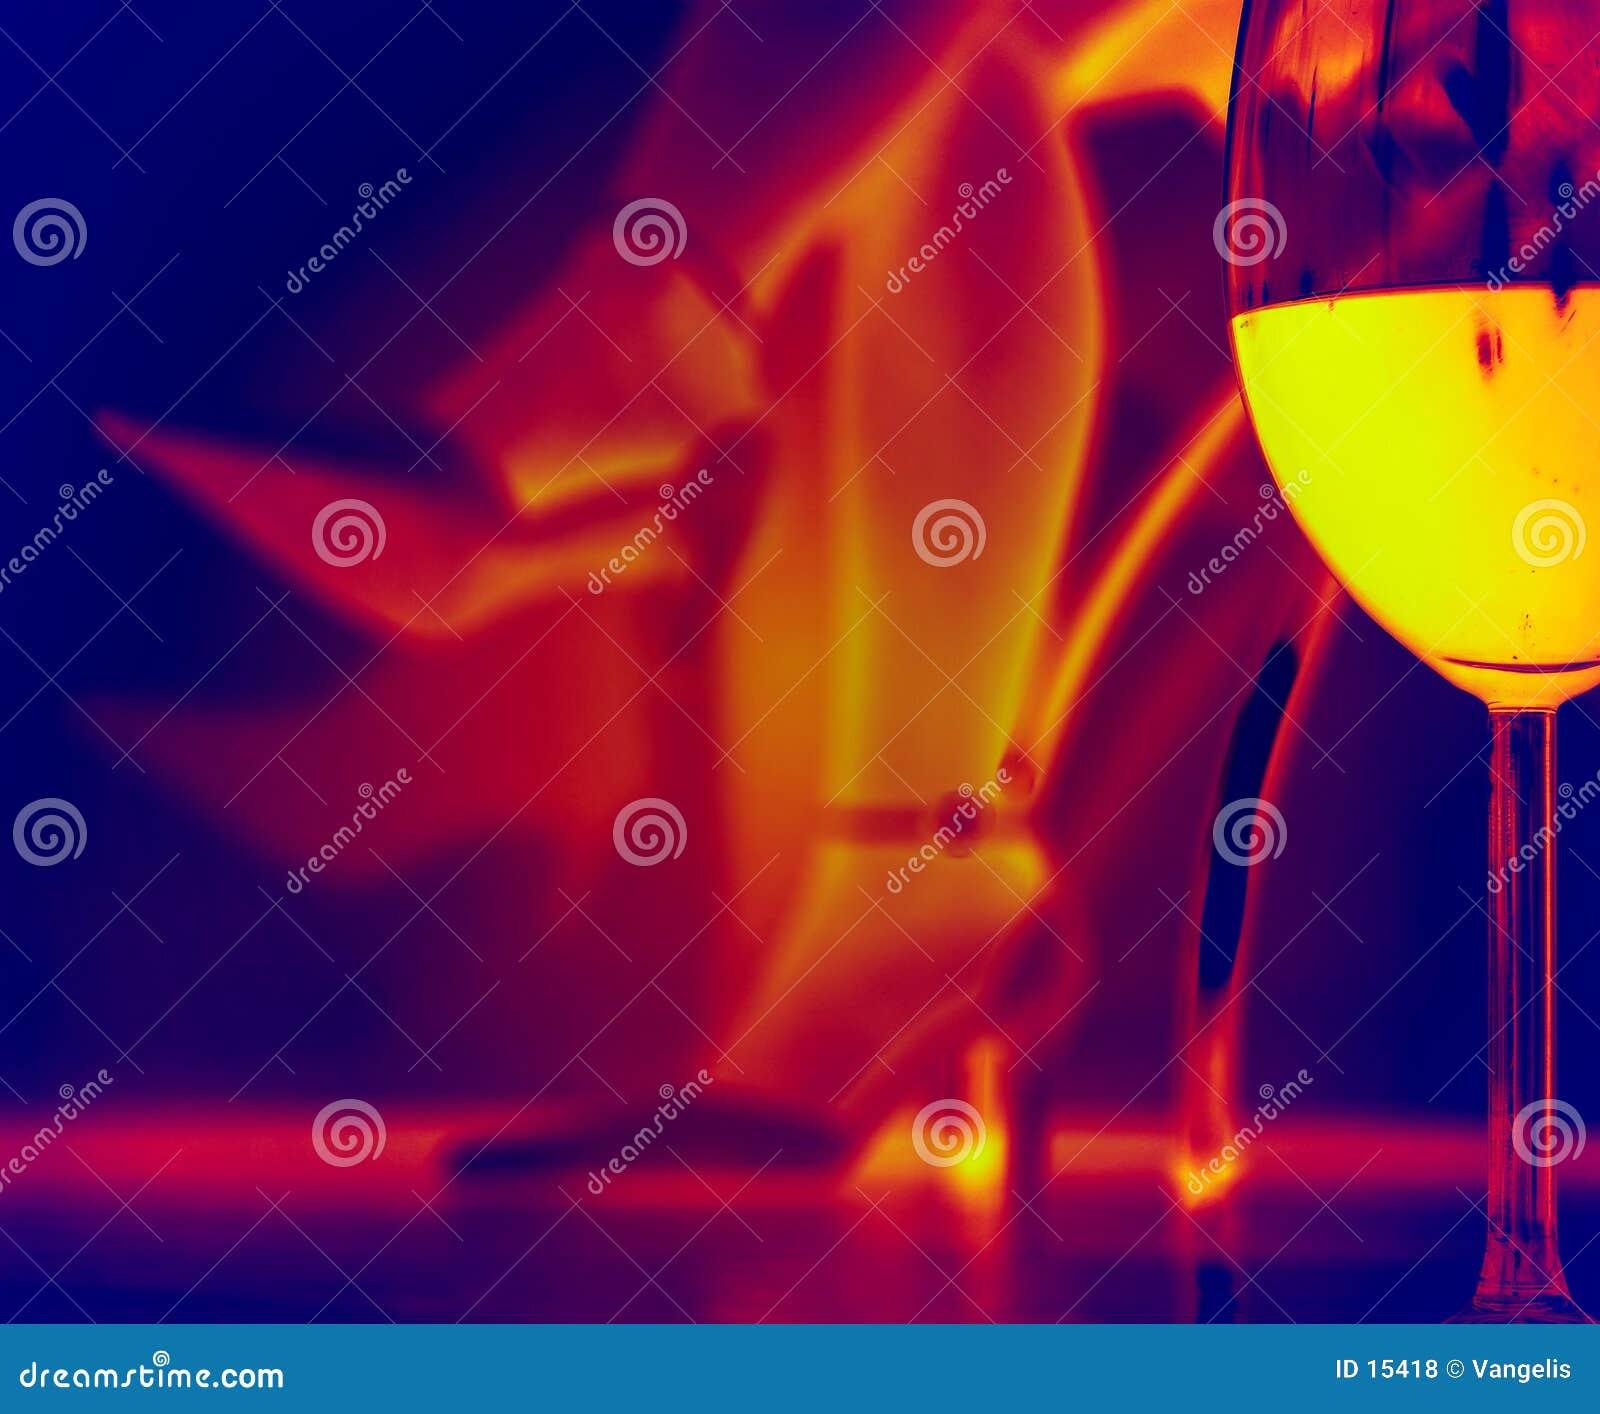 Tarde romántica con un vidrio de vino - infrarrojo